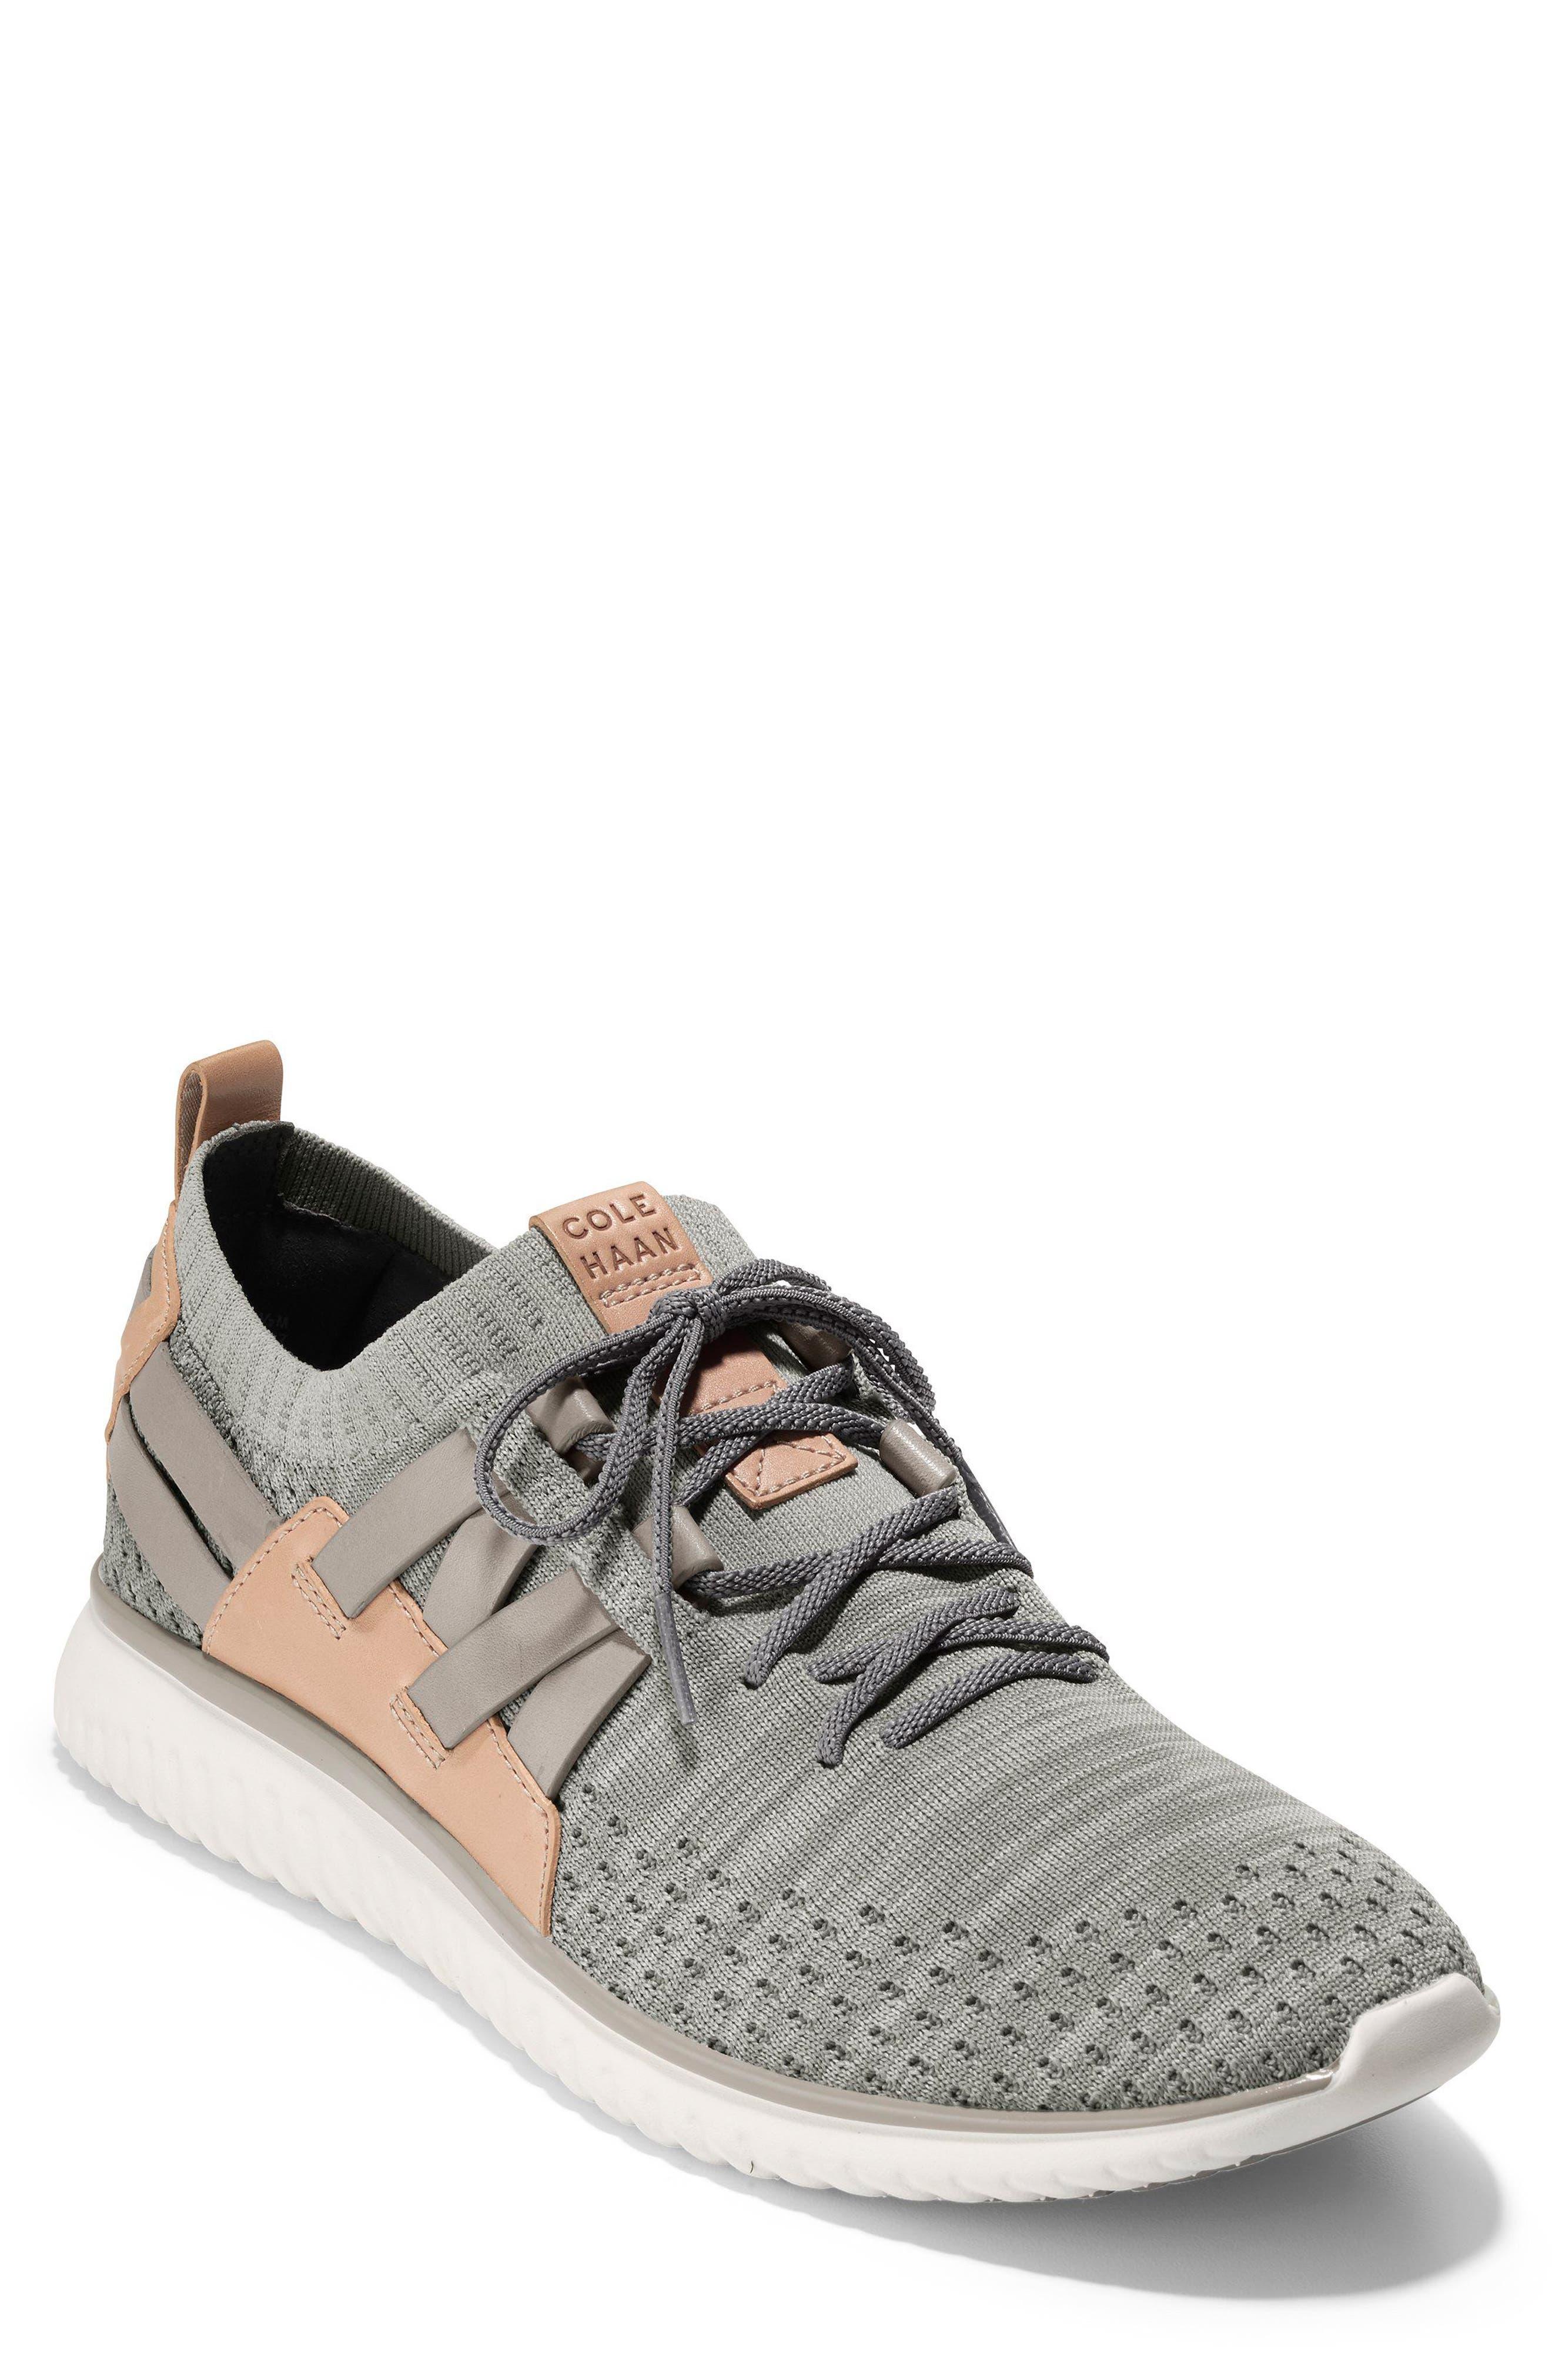 Grand Motion Sneaker,                             Main thumbnail 1, color,                             Rockridge/ Ivory